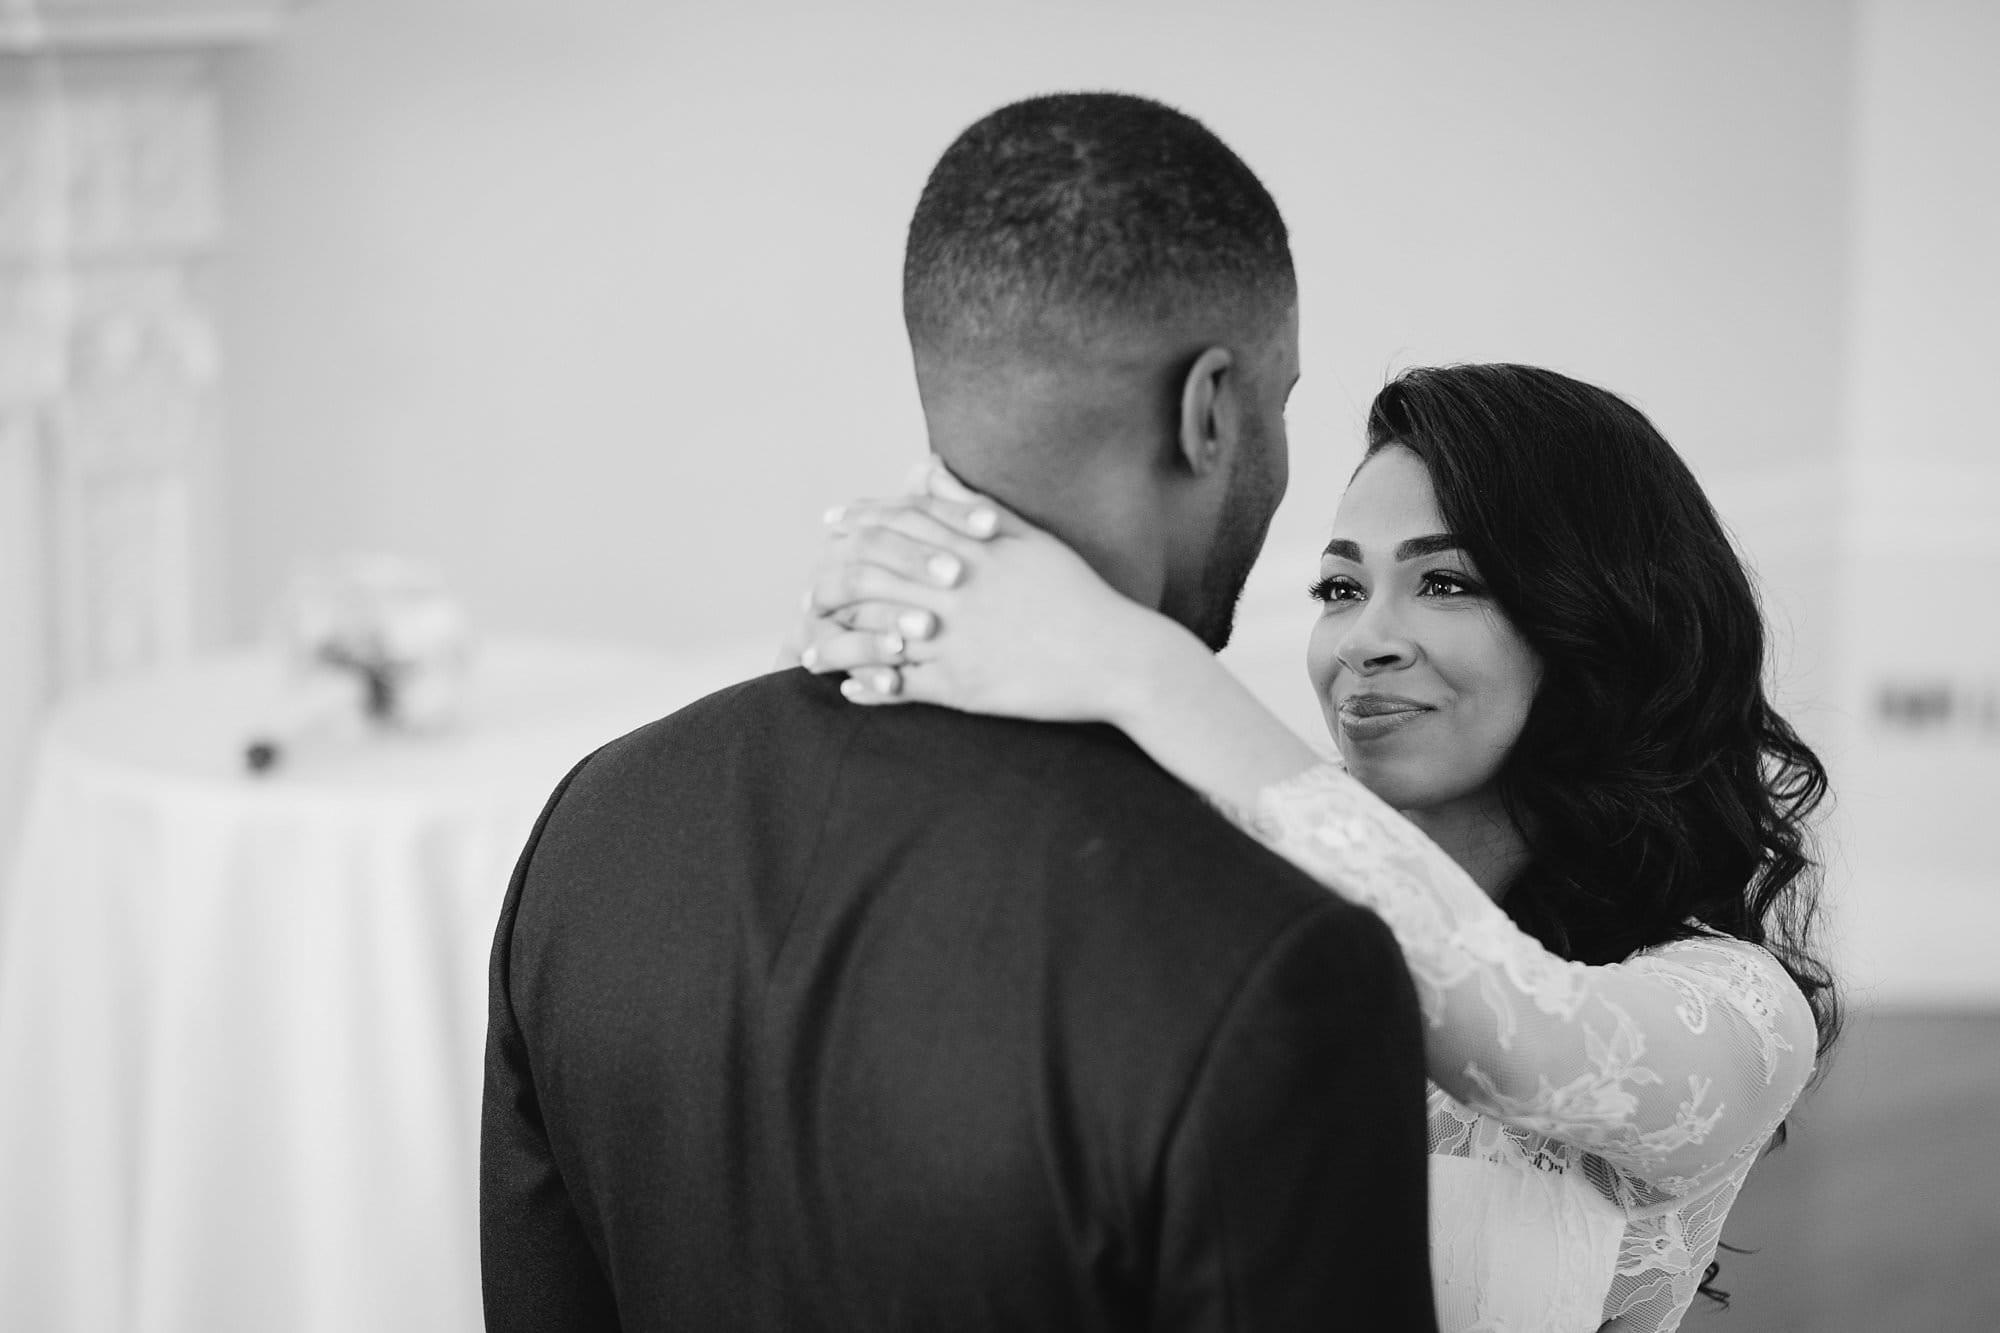 asia house london wedding photographer 013 - Rachel + Gabriel   Asia House Wedding Photography